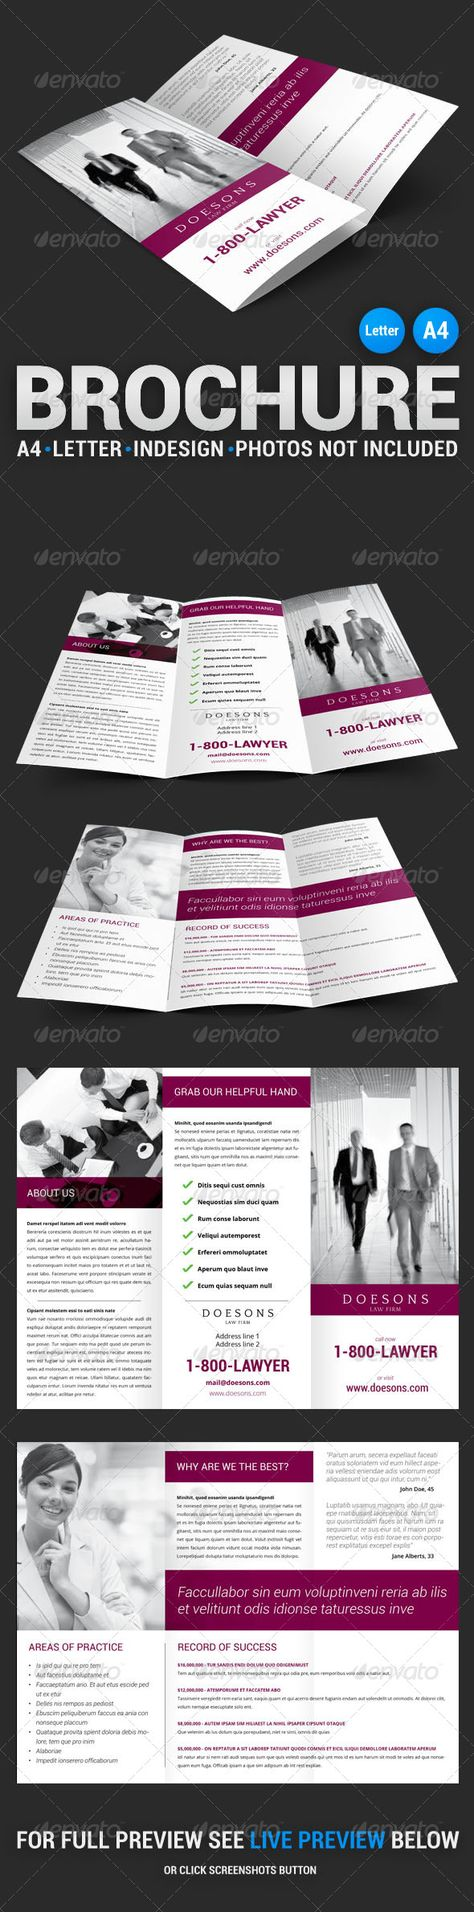 Law Firm Brochure Design  Dtp Ideas    Brochures